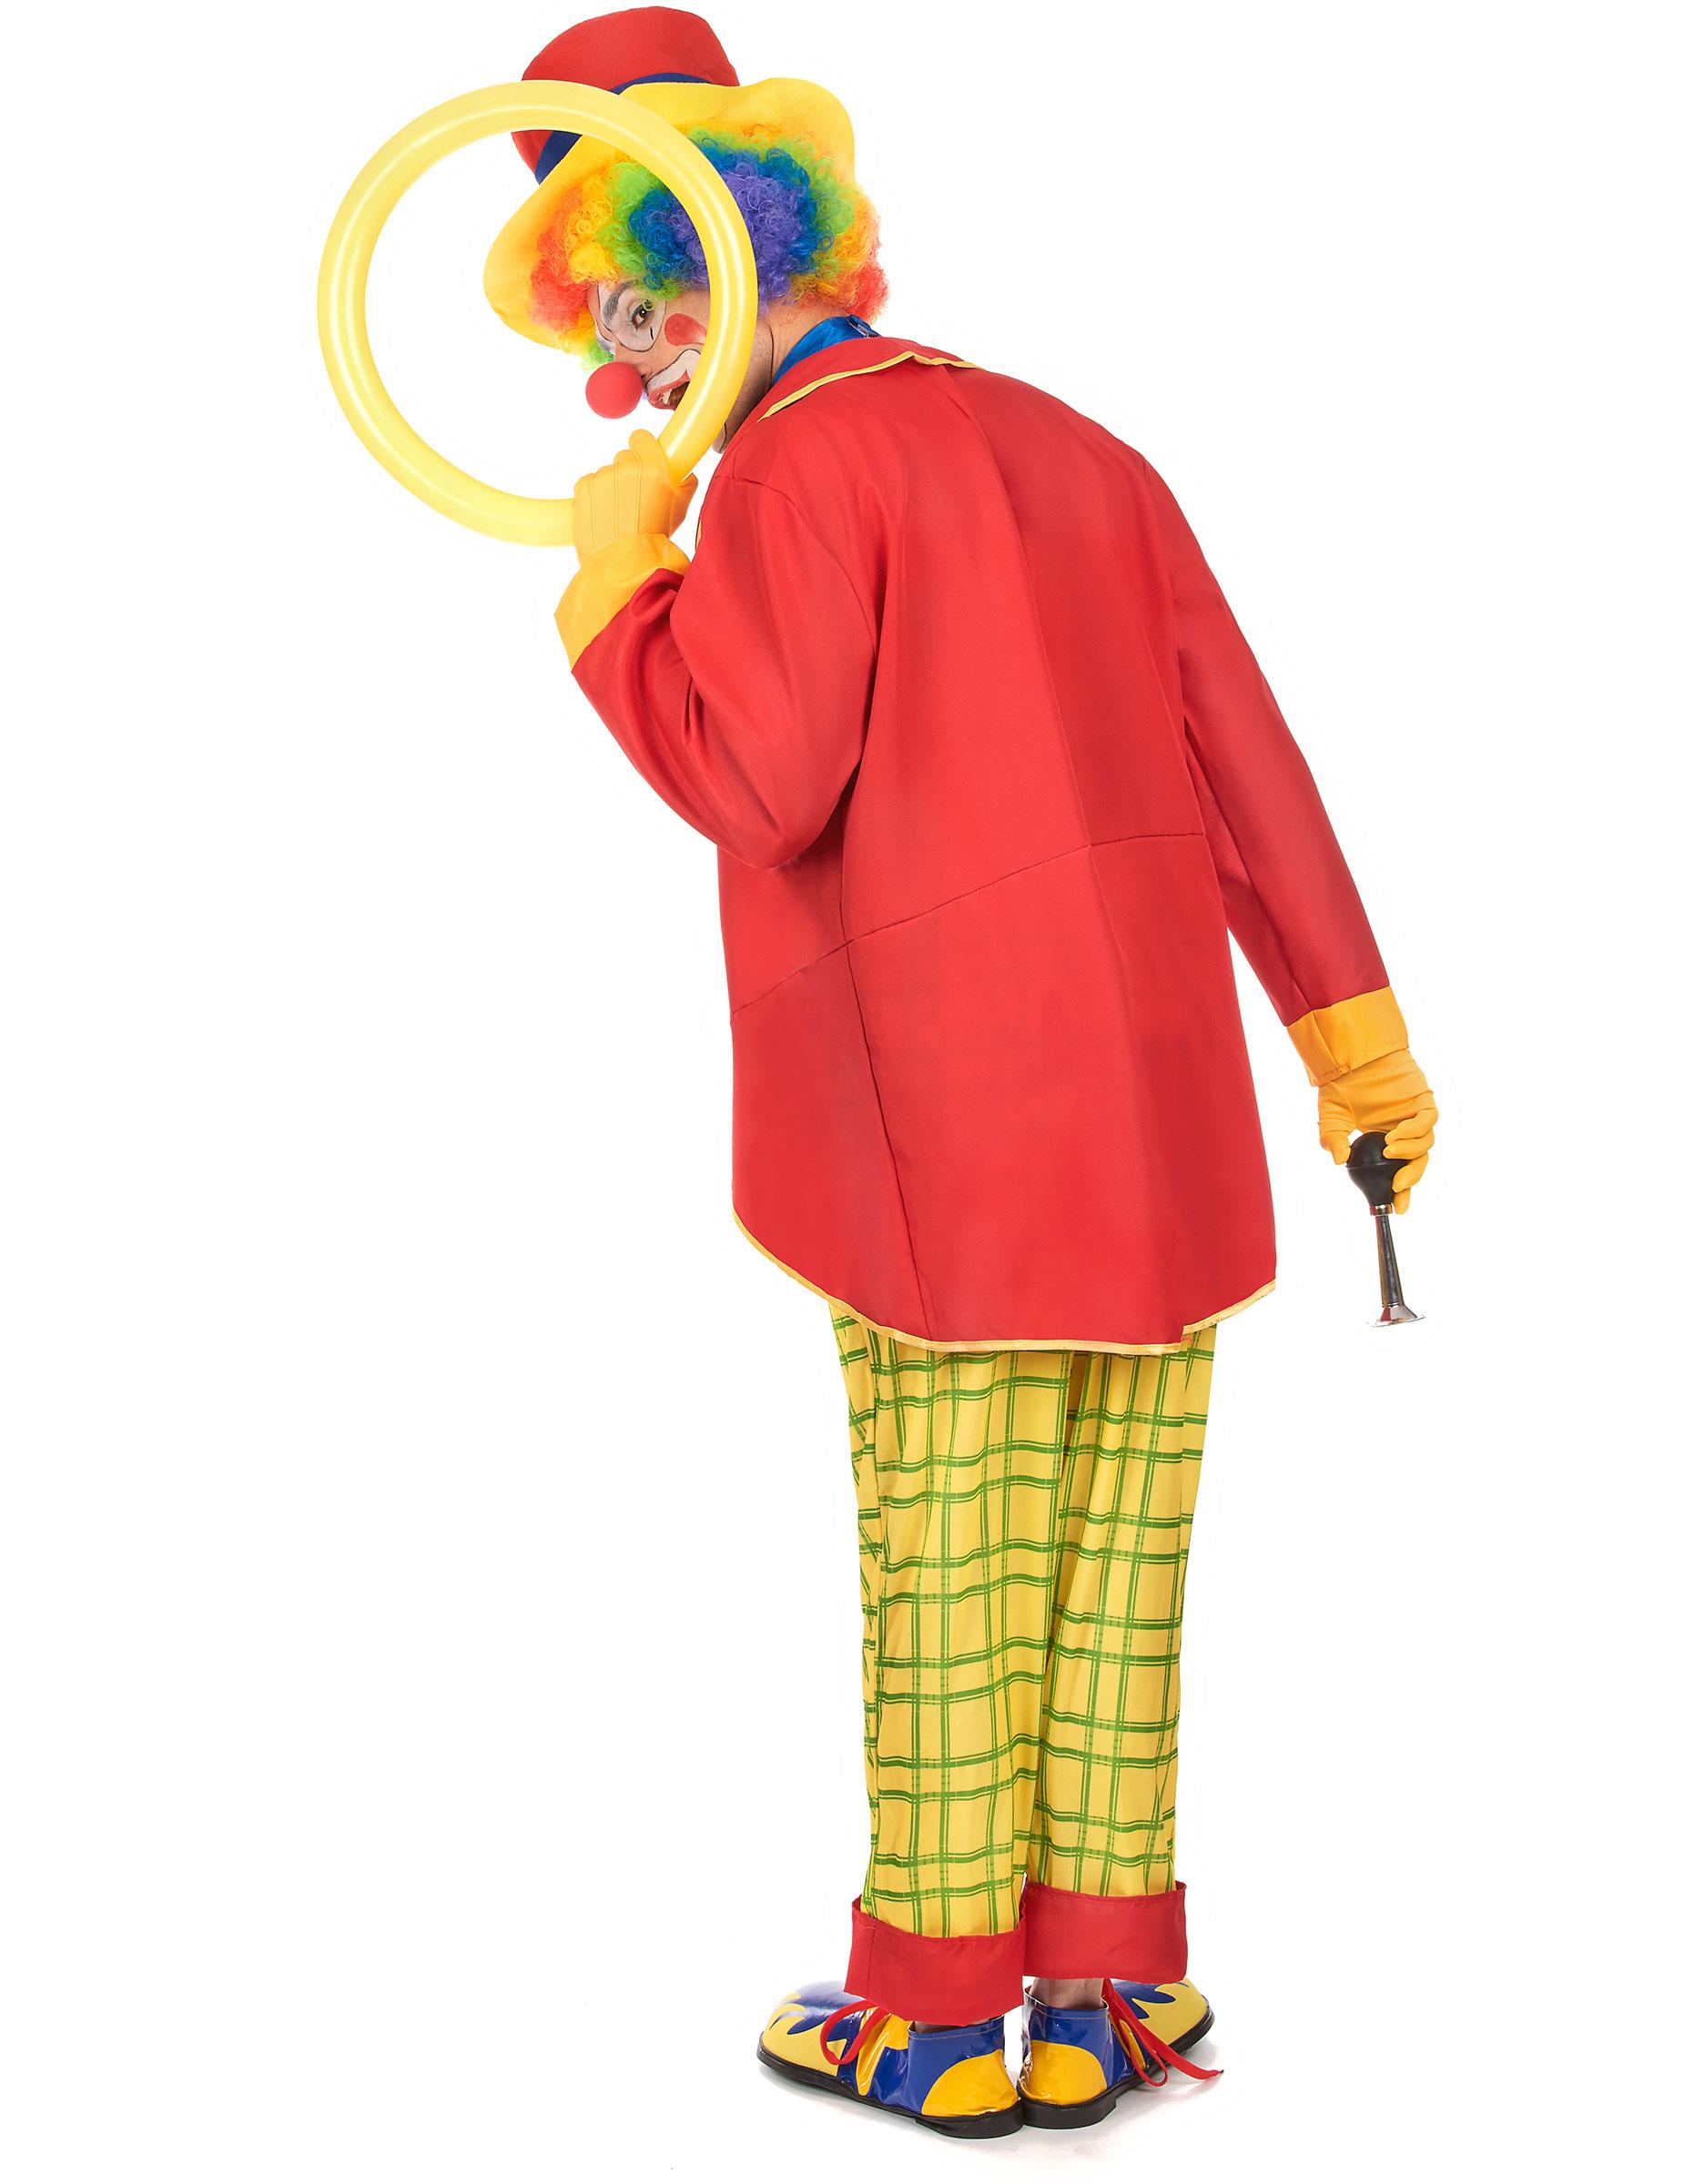 clown kost m f r herren kost me f r erwachsene und g nstige faschingskost me vegaoo. Black Bedroom Furniture Sets. Home Design Ideas